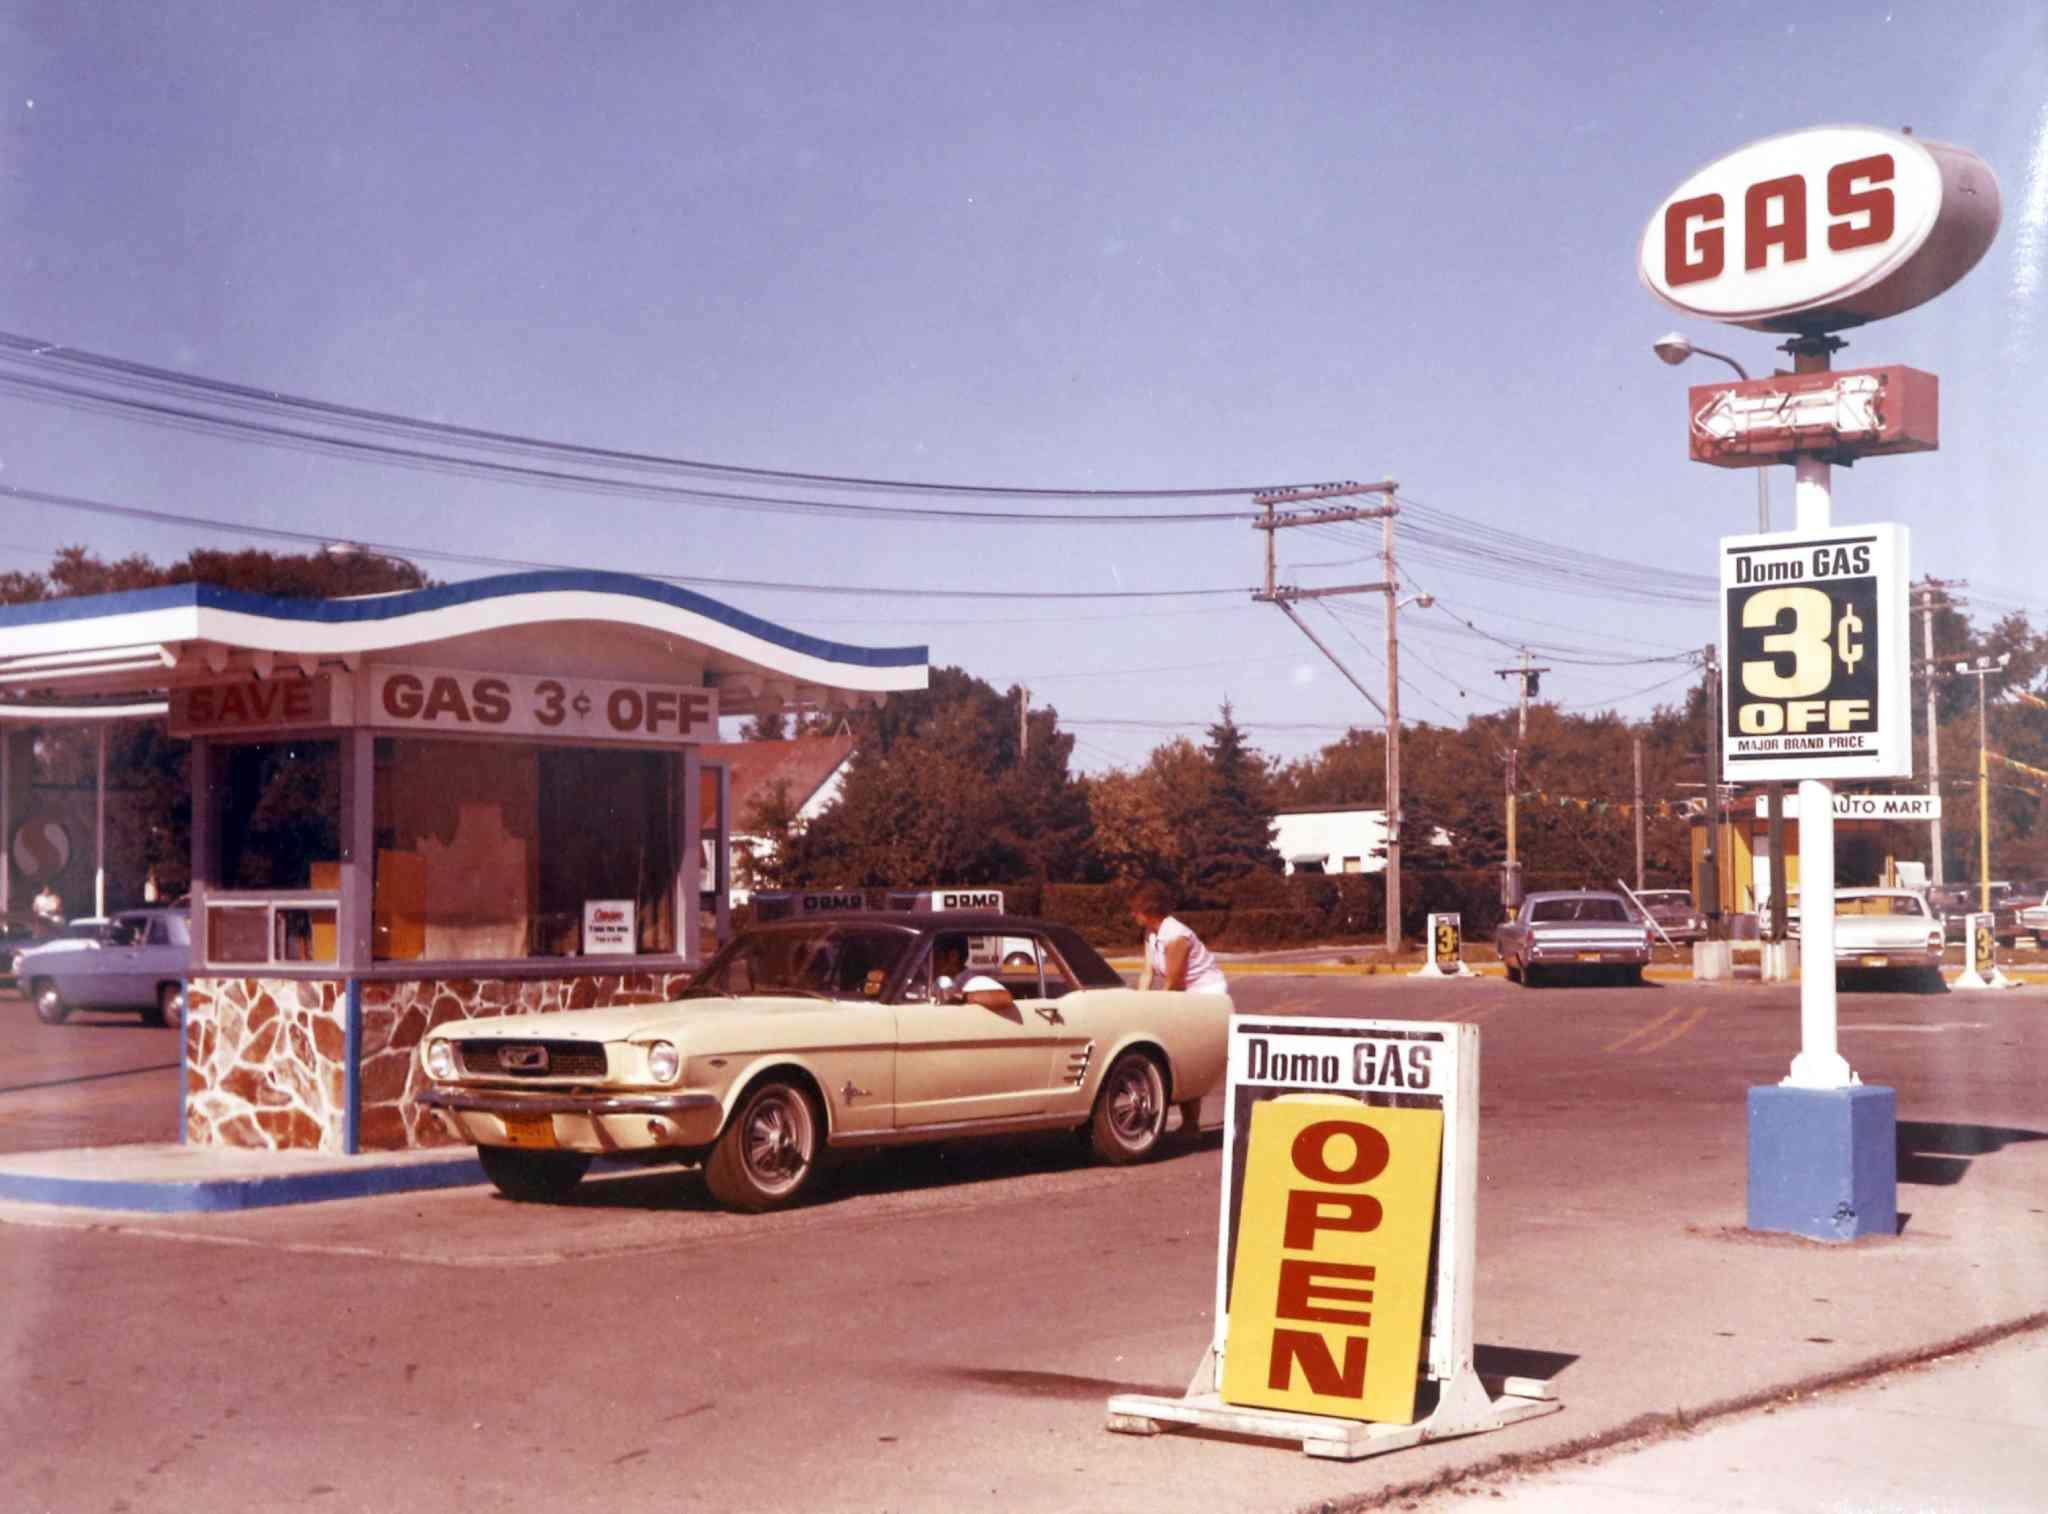 Vieille photo qui inclus des Mustang 65-73  Winnip10